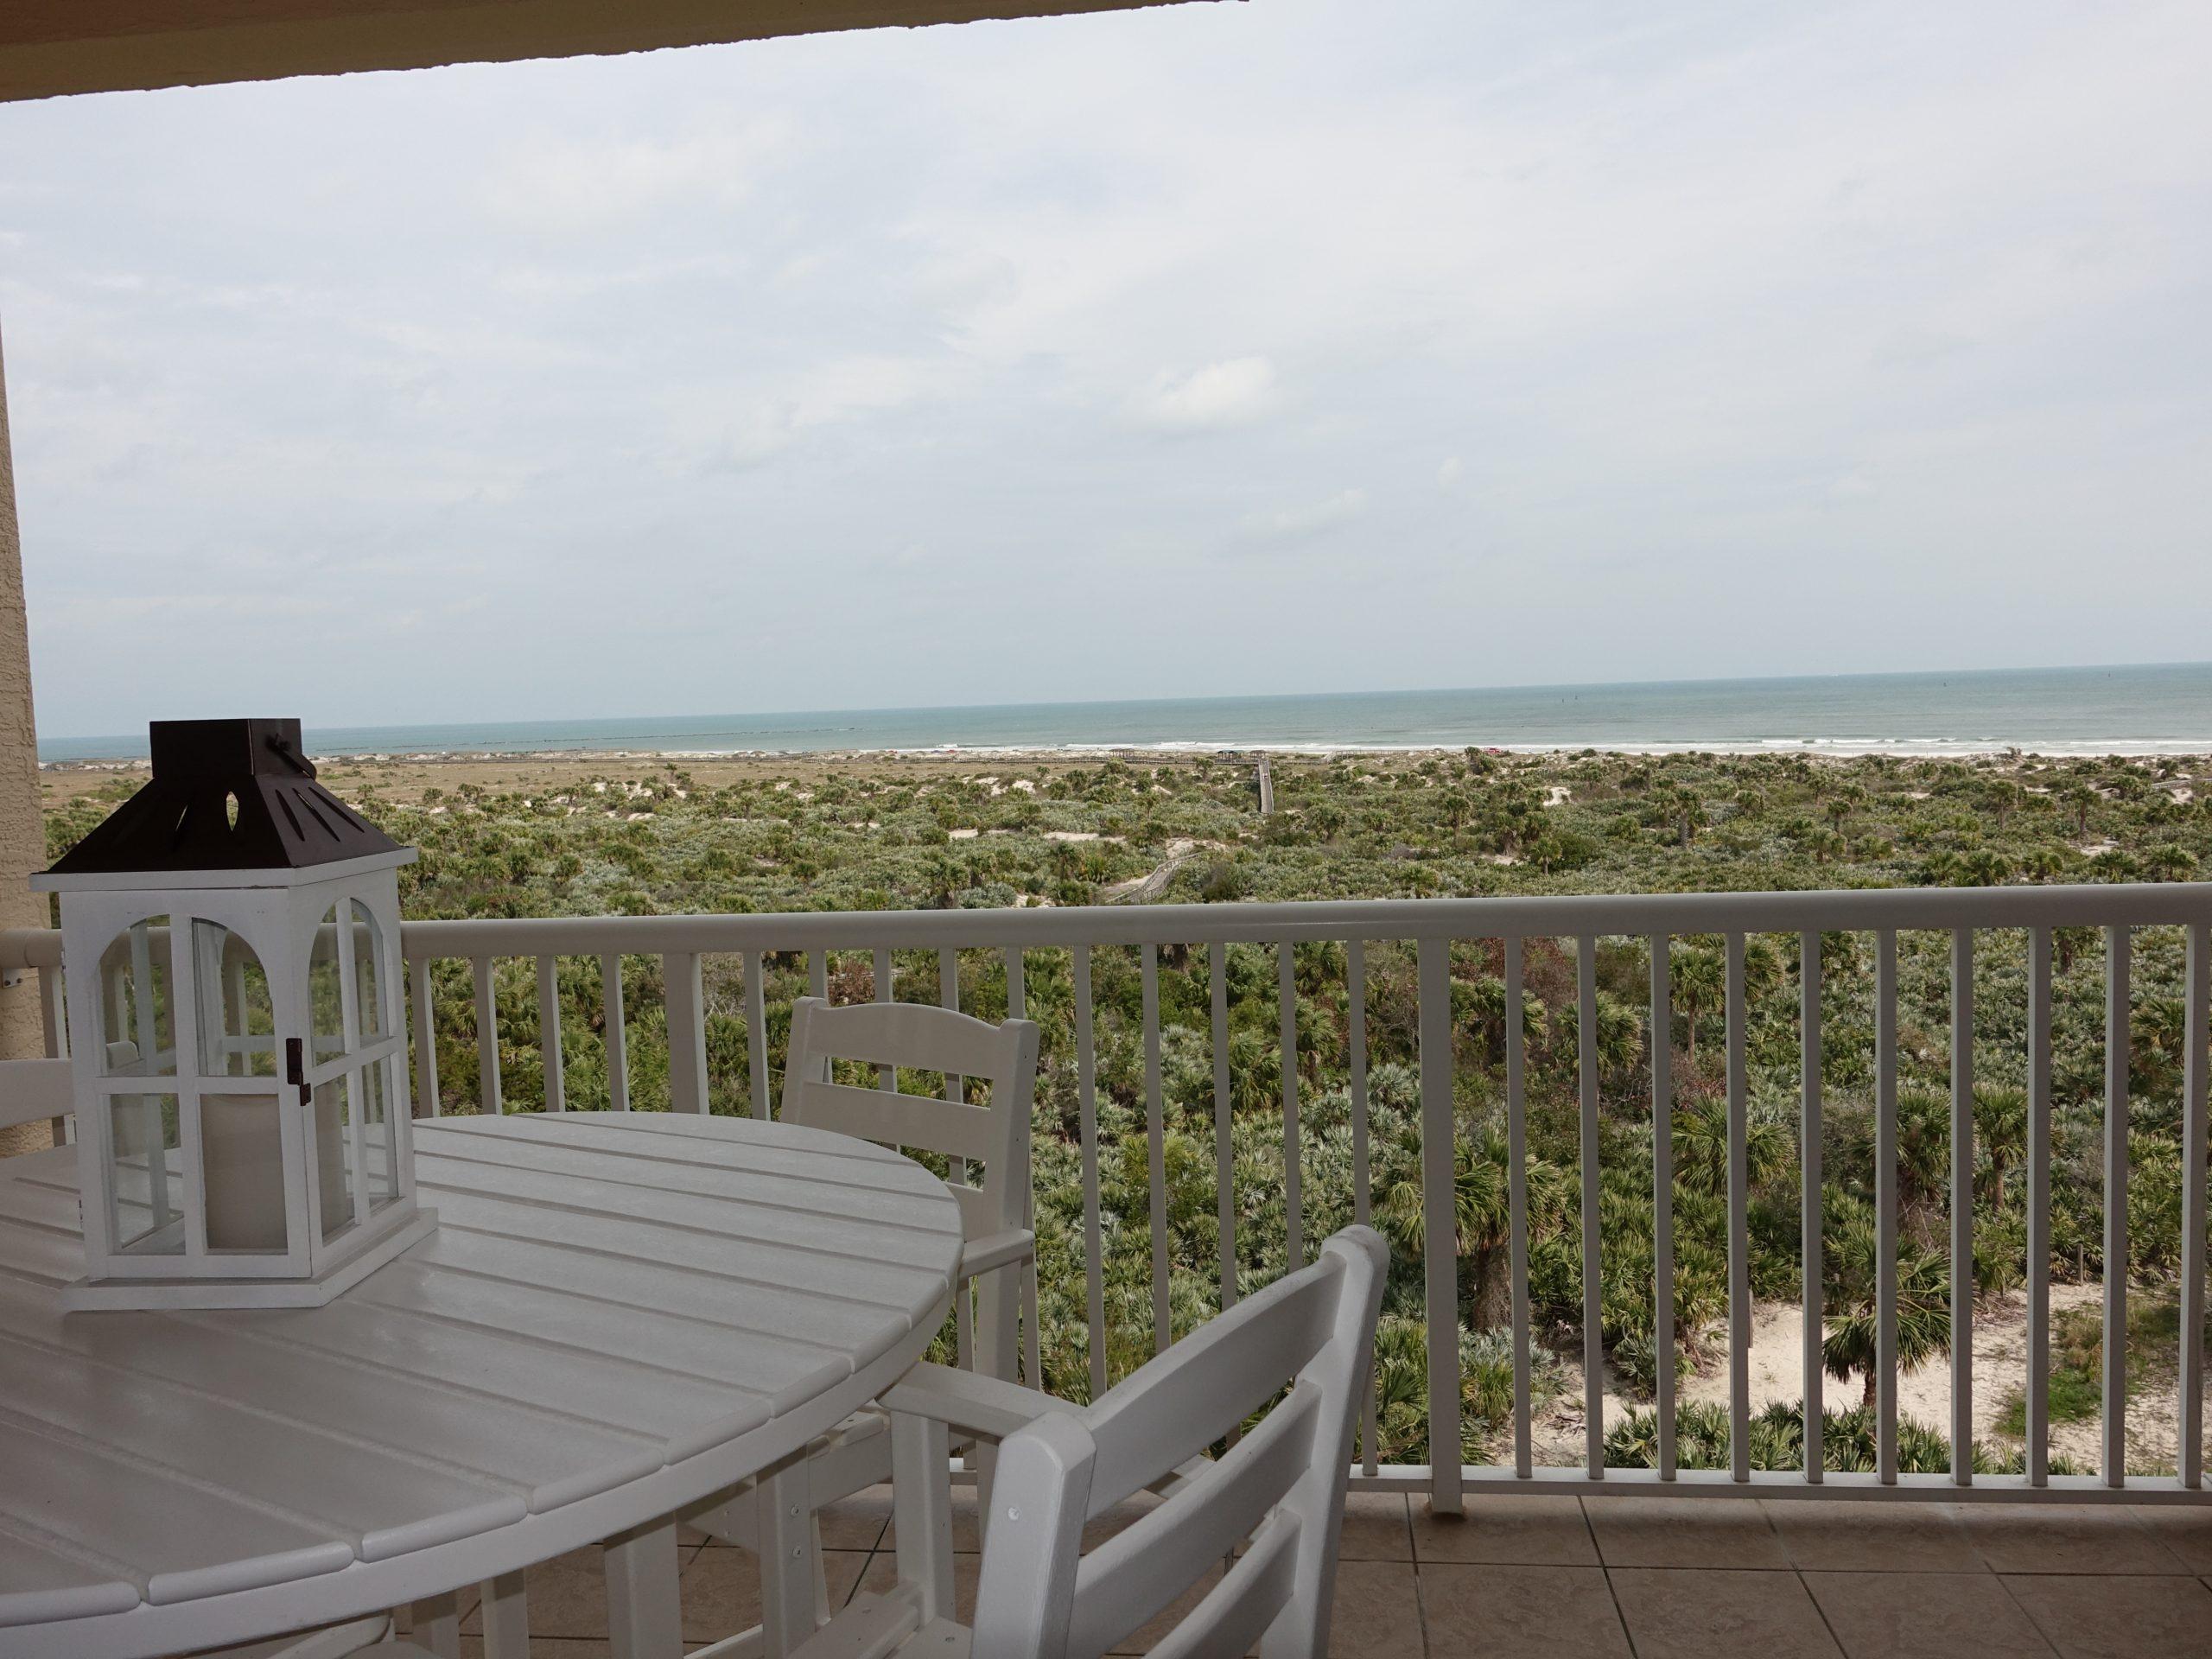 261 Minorca Beach Way, Unit #704